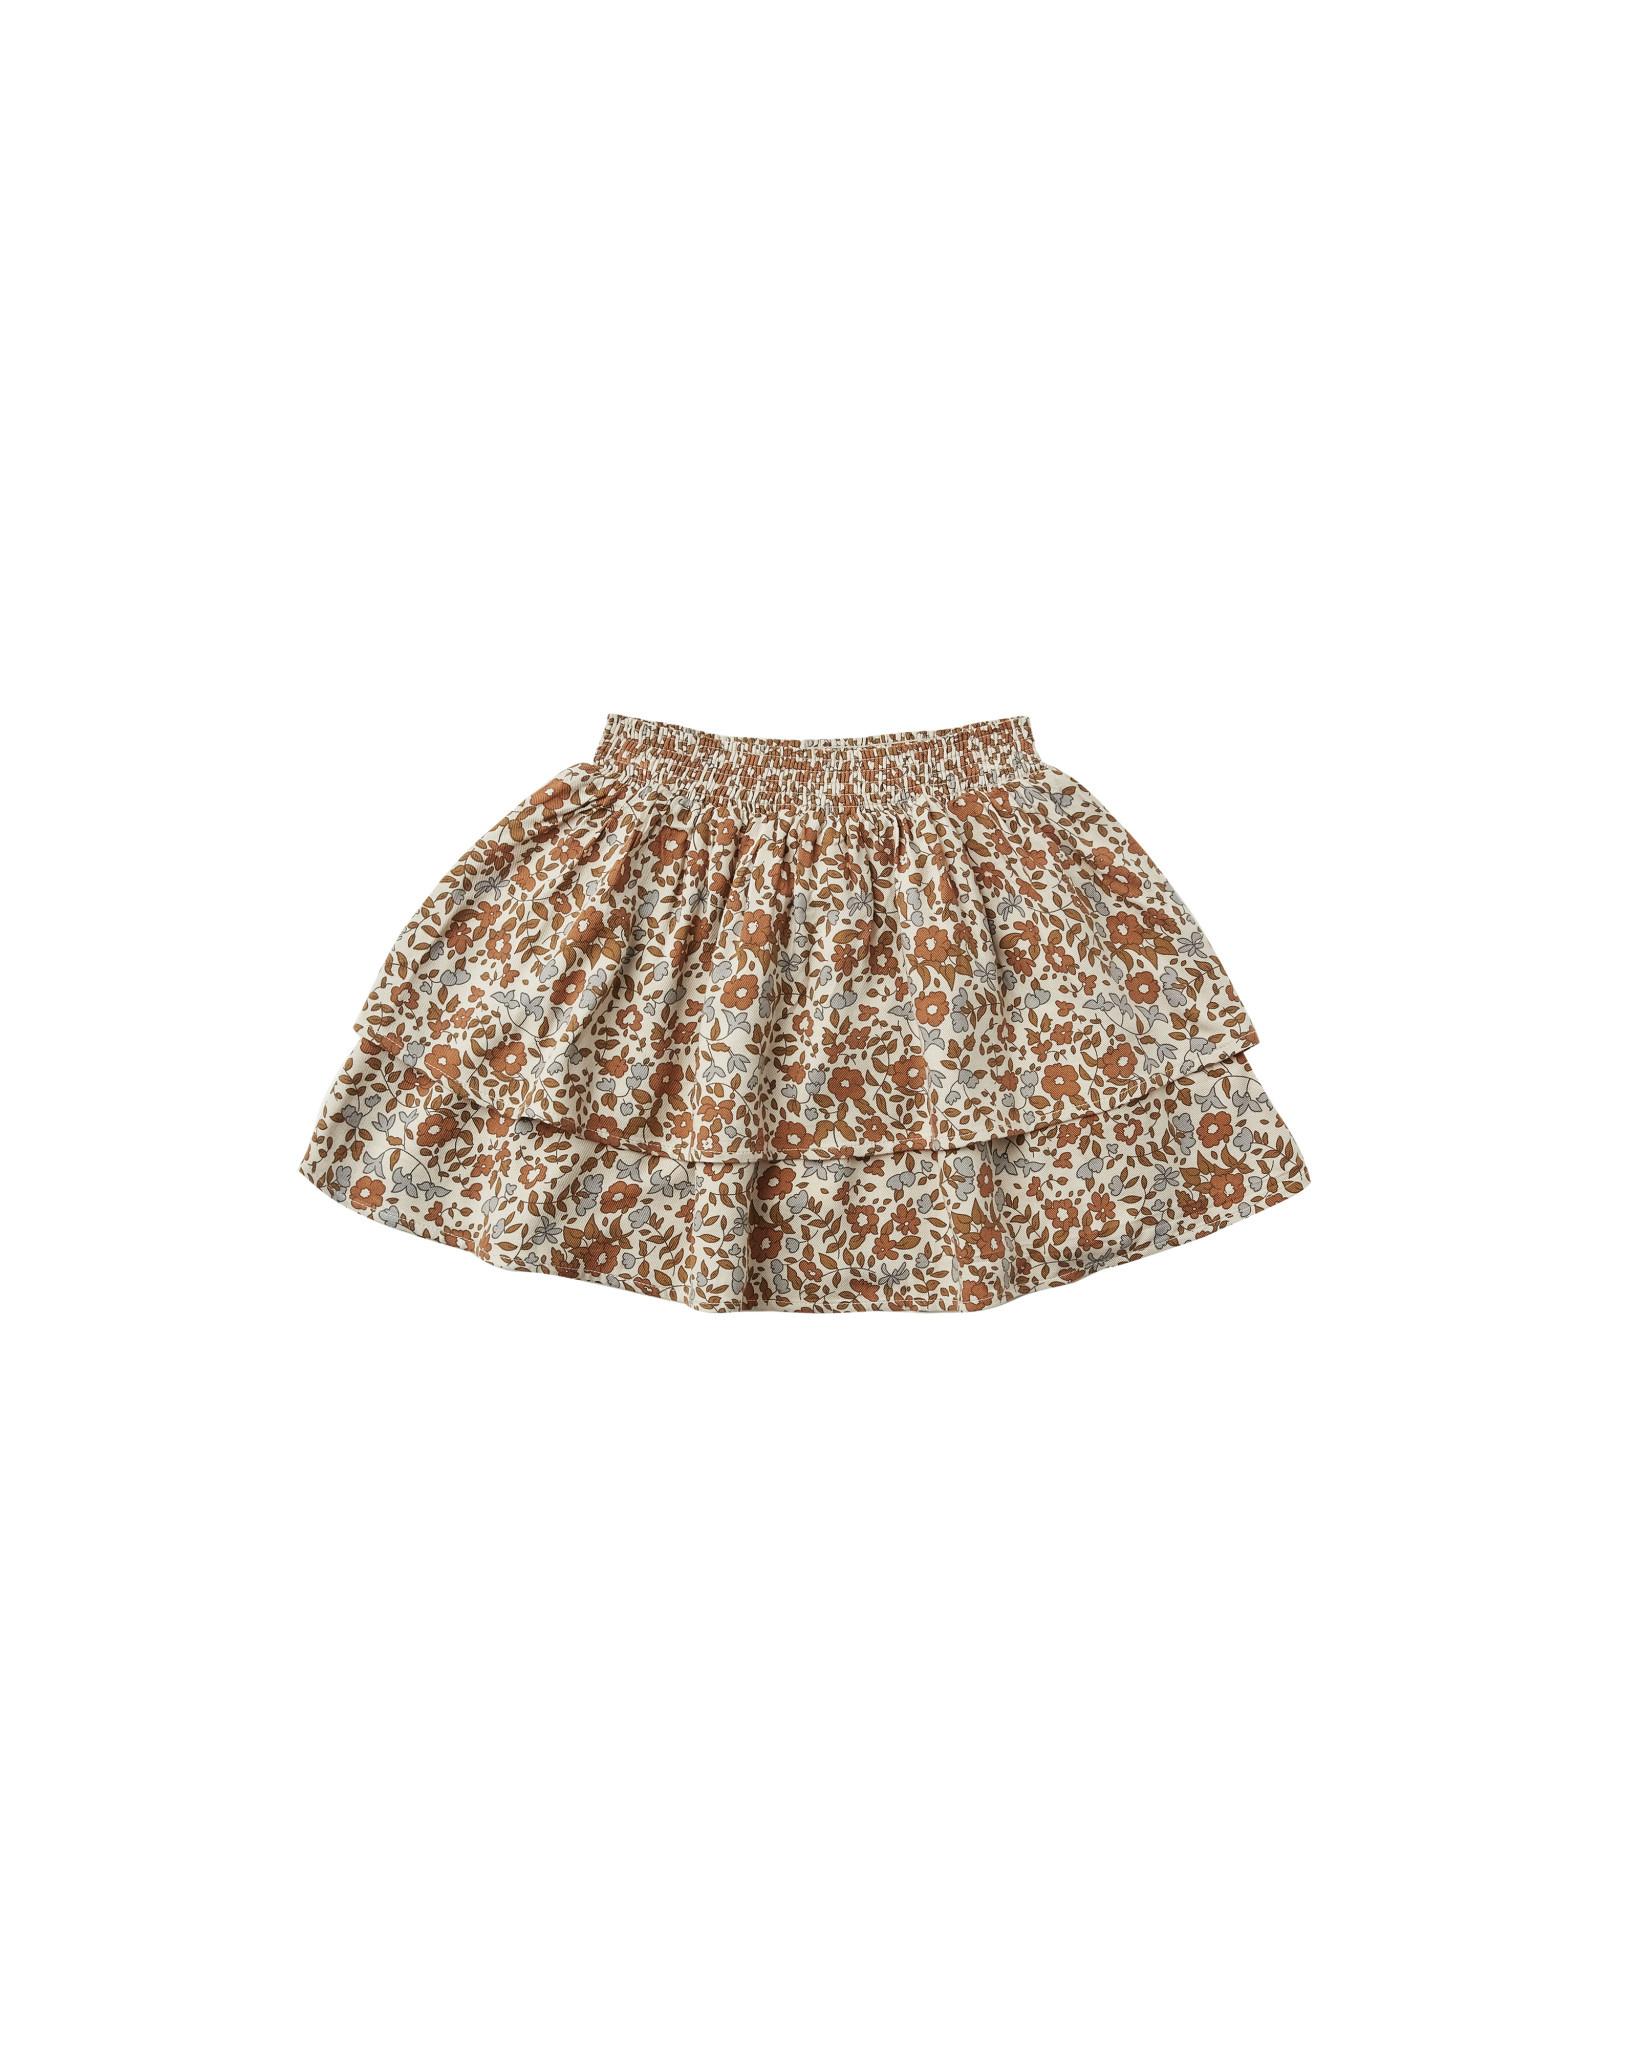 RYLEE AND CRU Bloom Tiered Mini Skirt